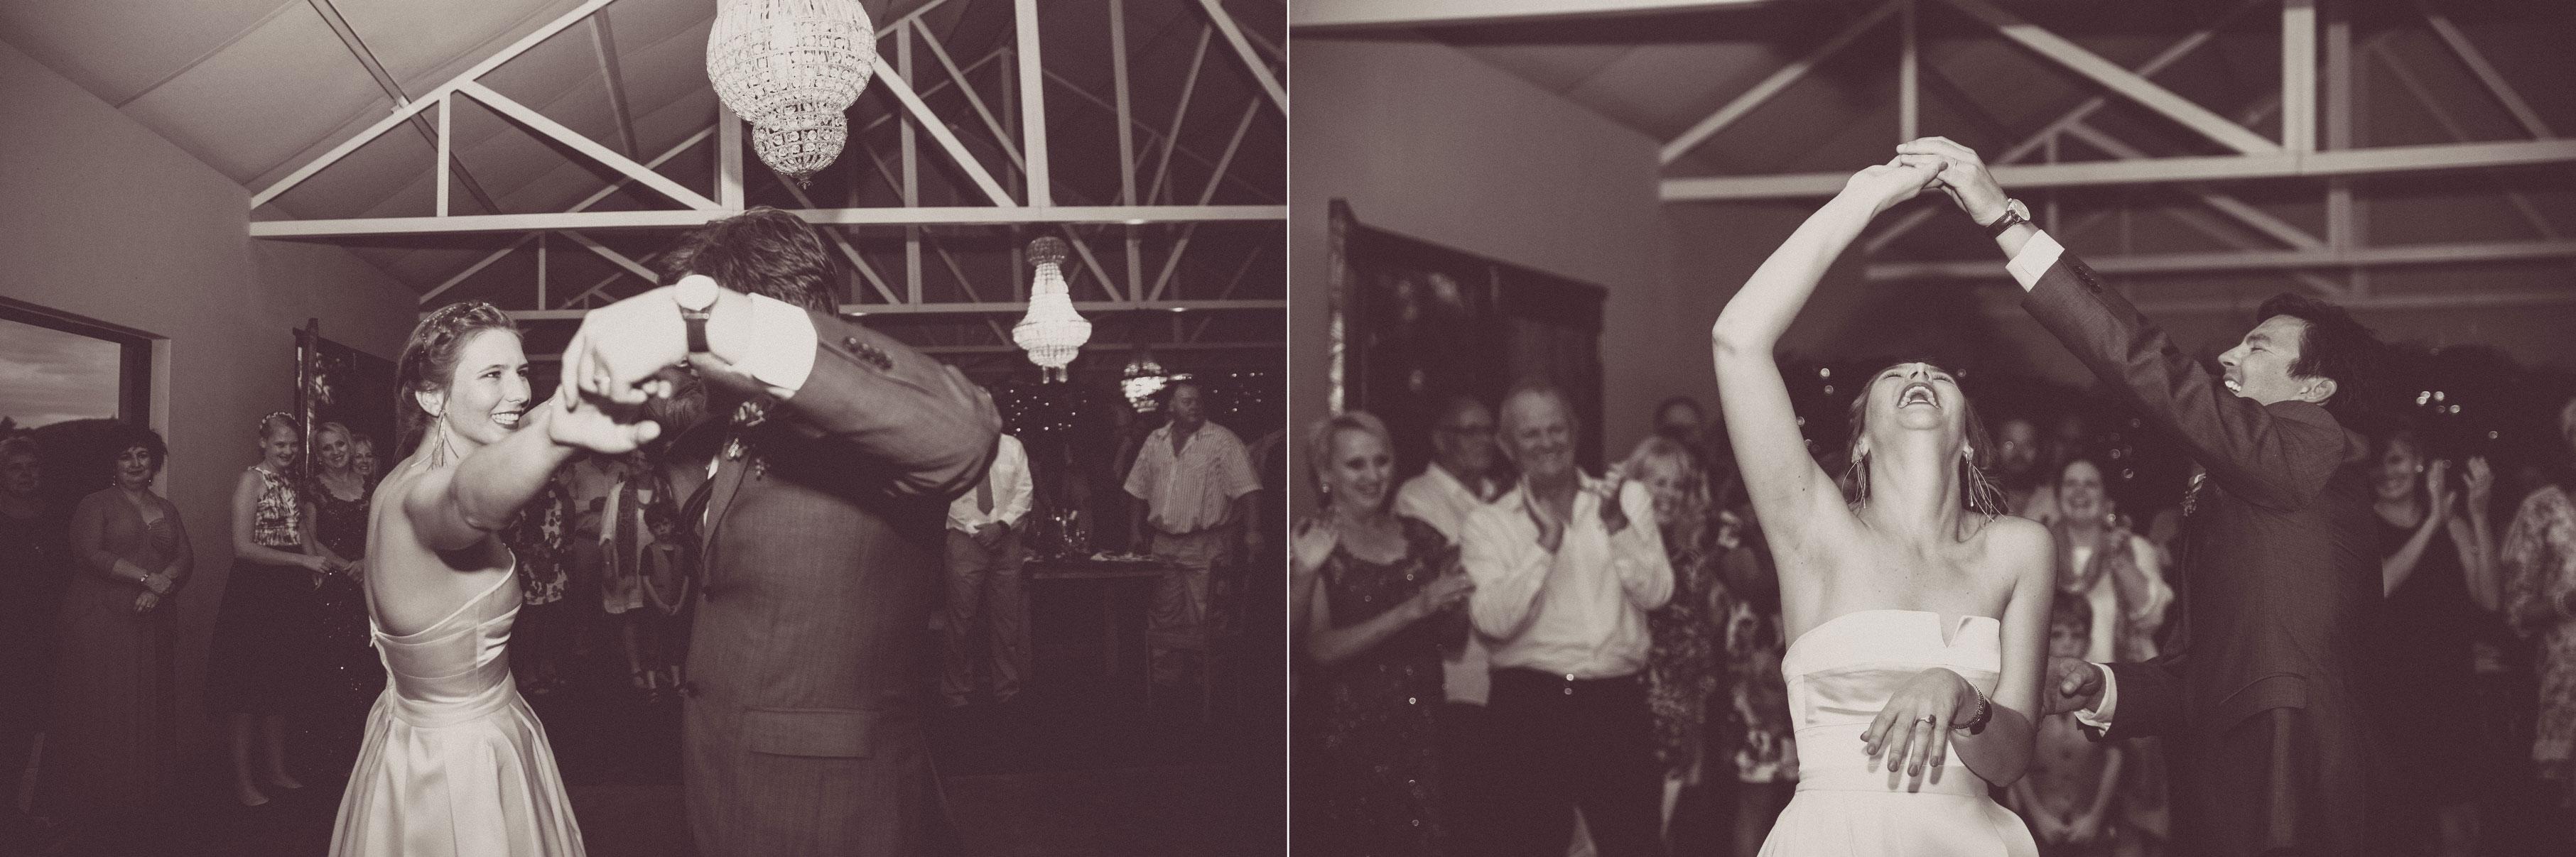 The Nutcracker_Wedding Photography_Maryke Albertyn 53